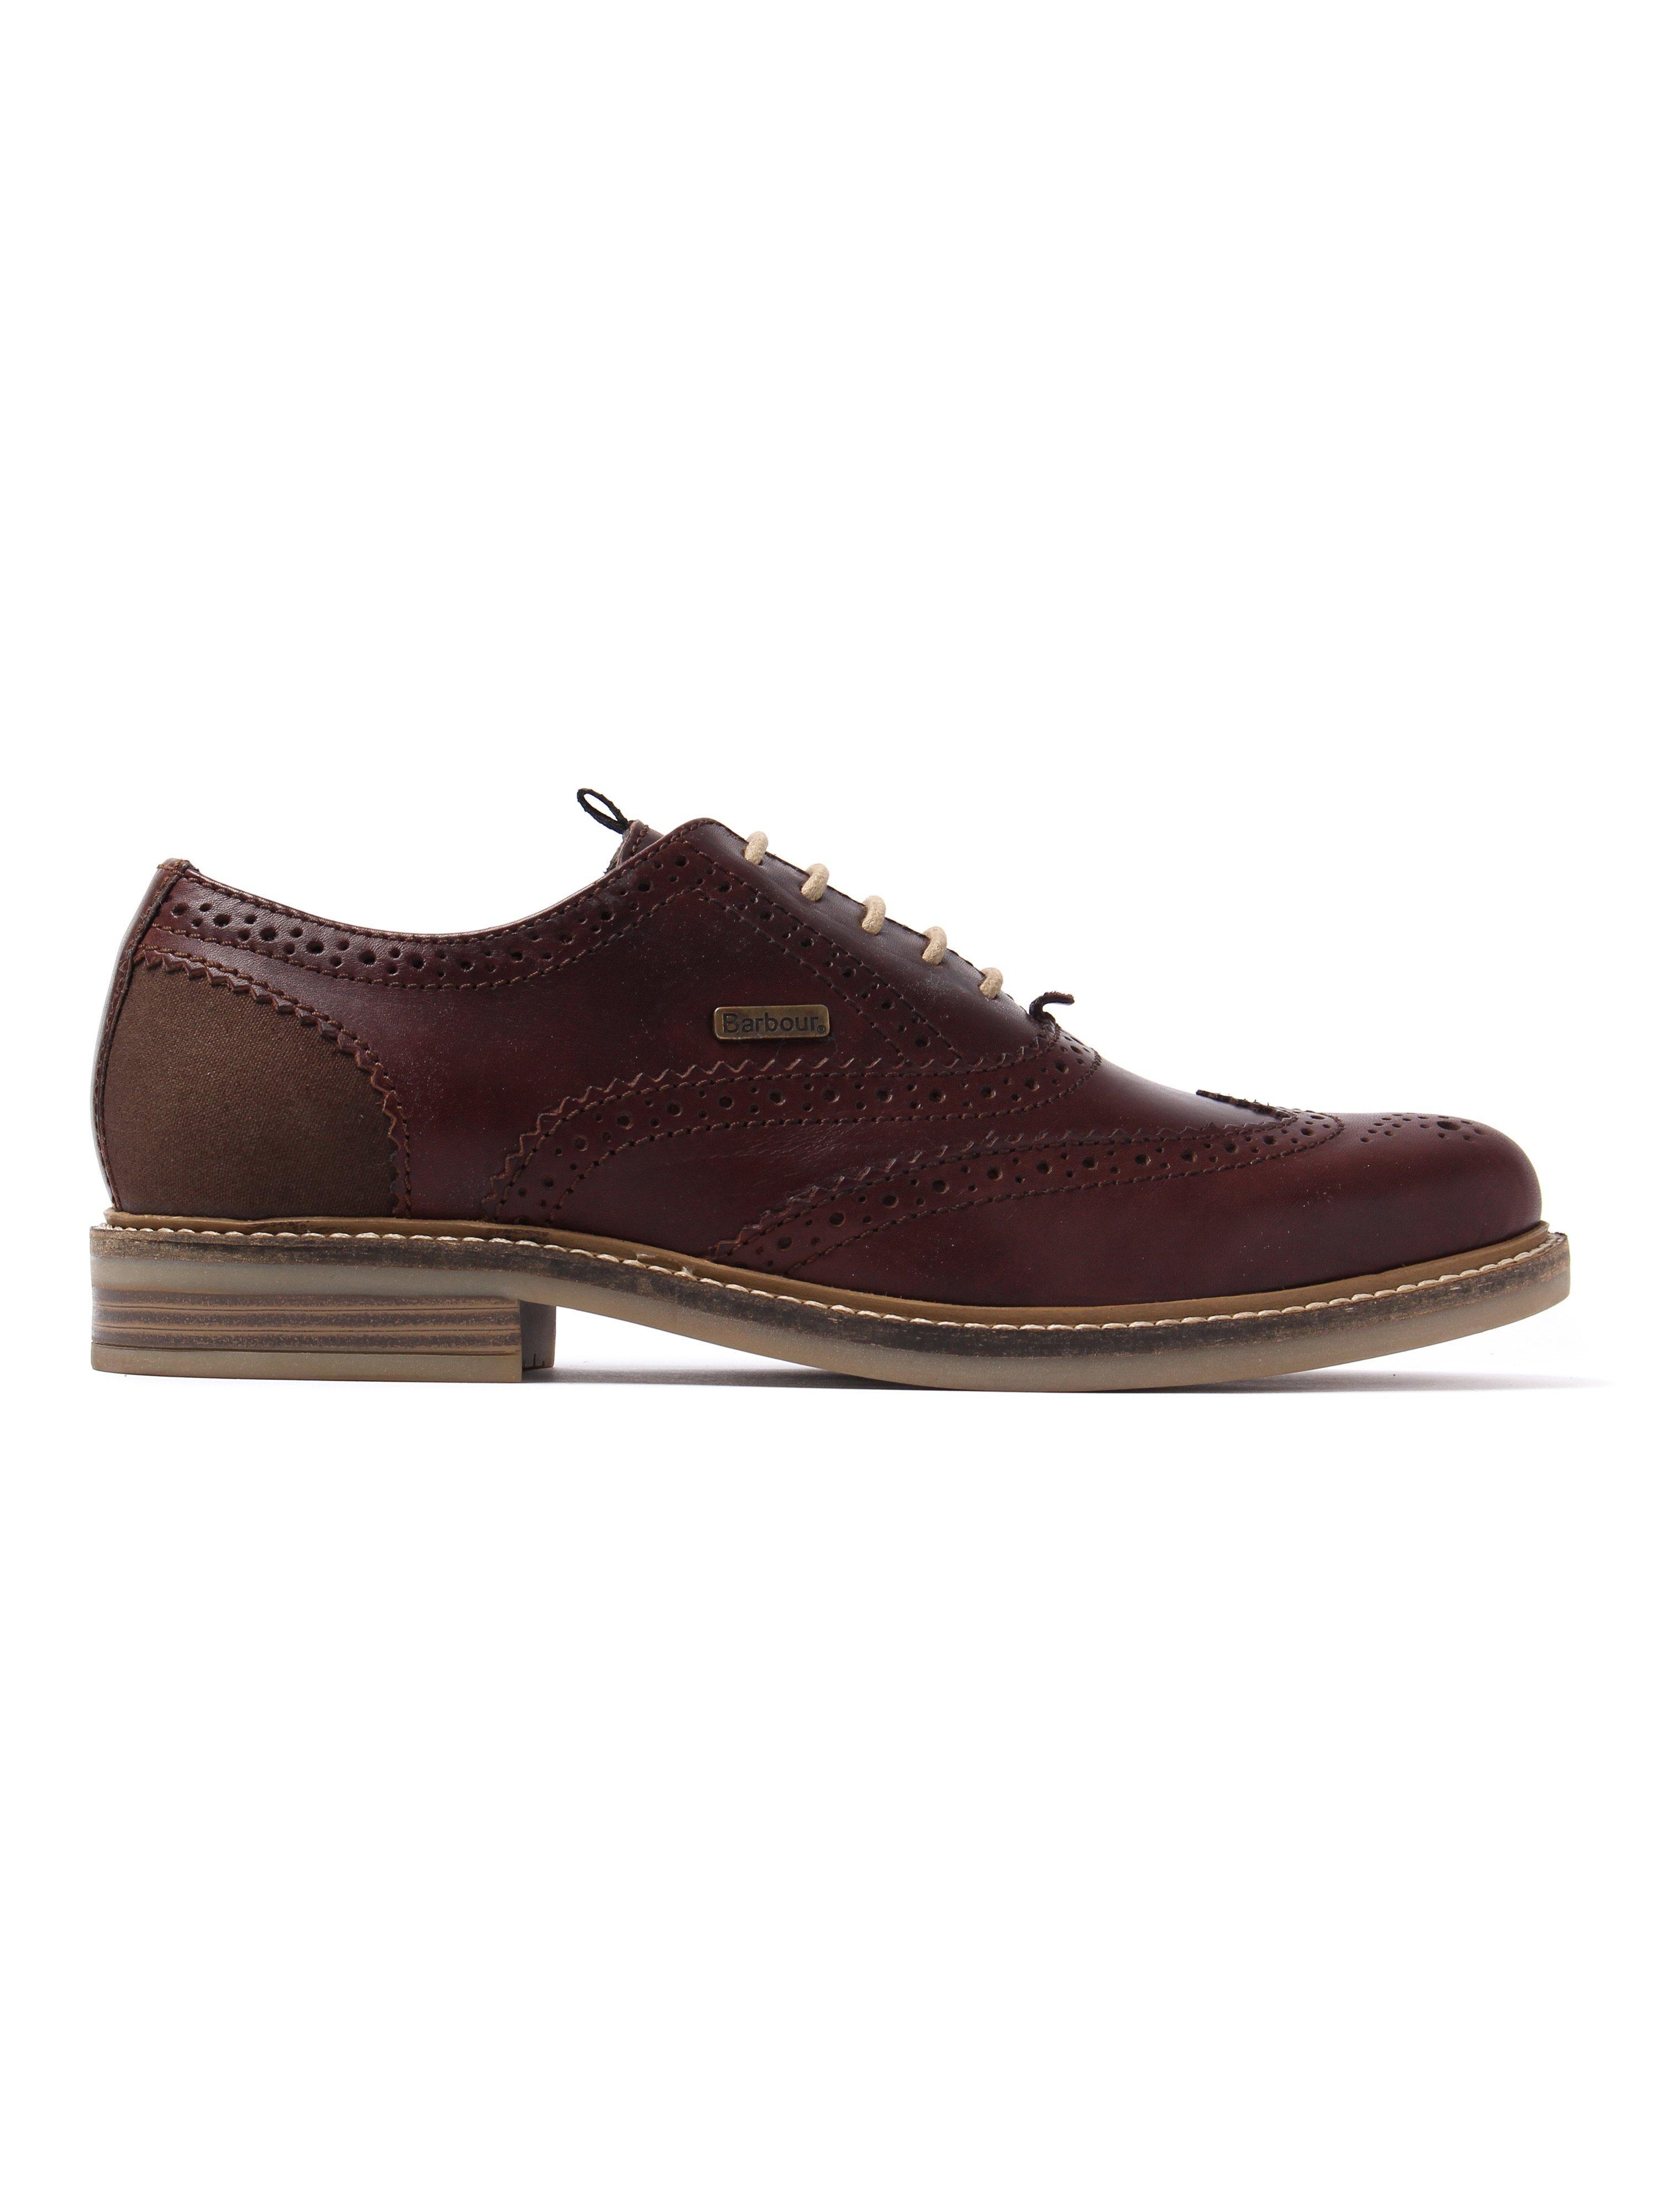 Barbour Men's Redcar Leather Oxford Brogues - Dark Brown